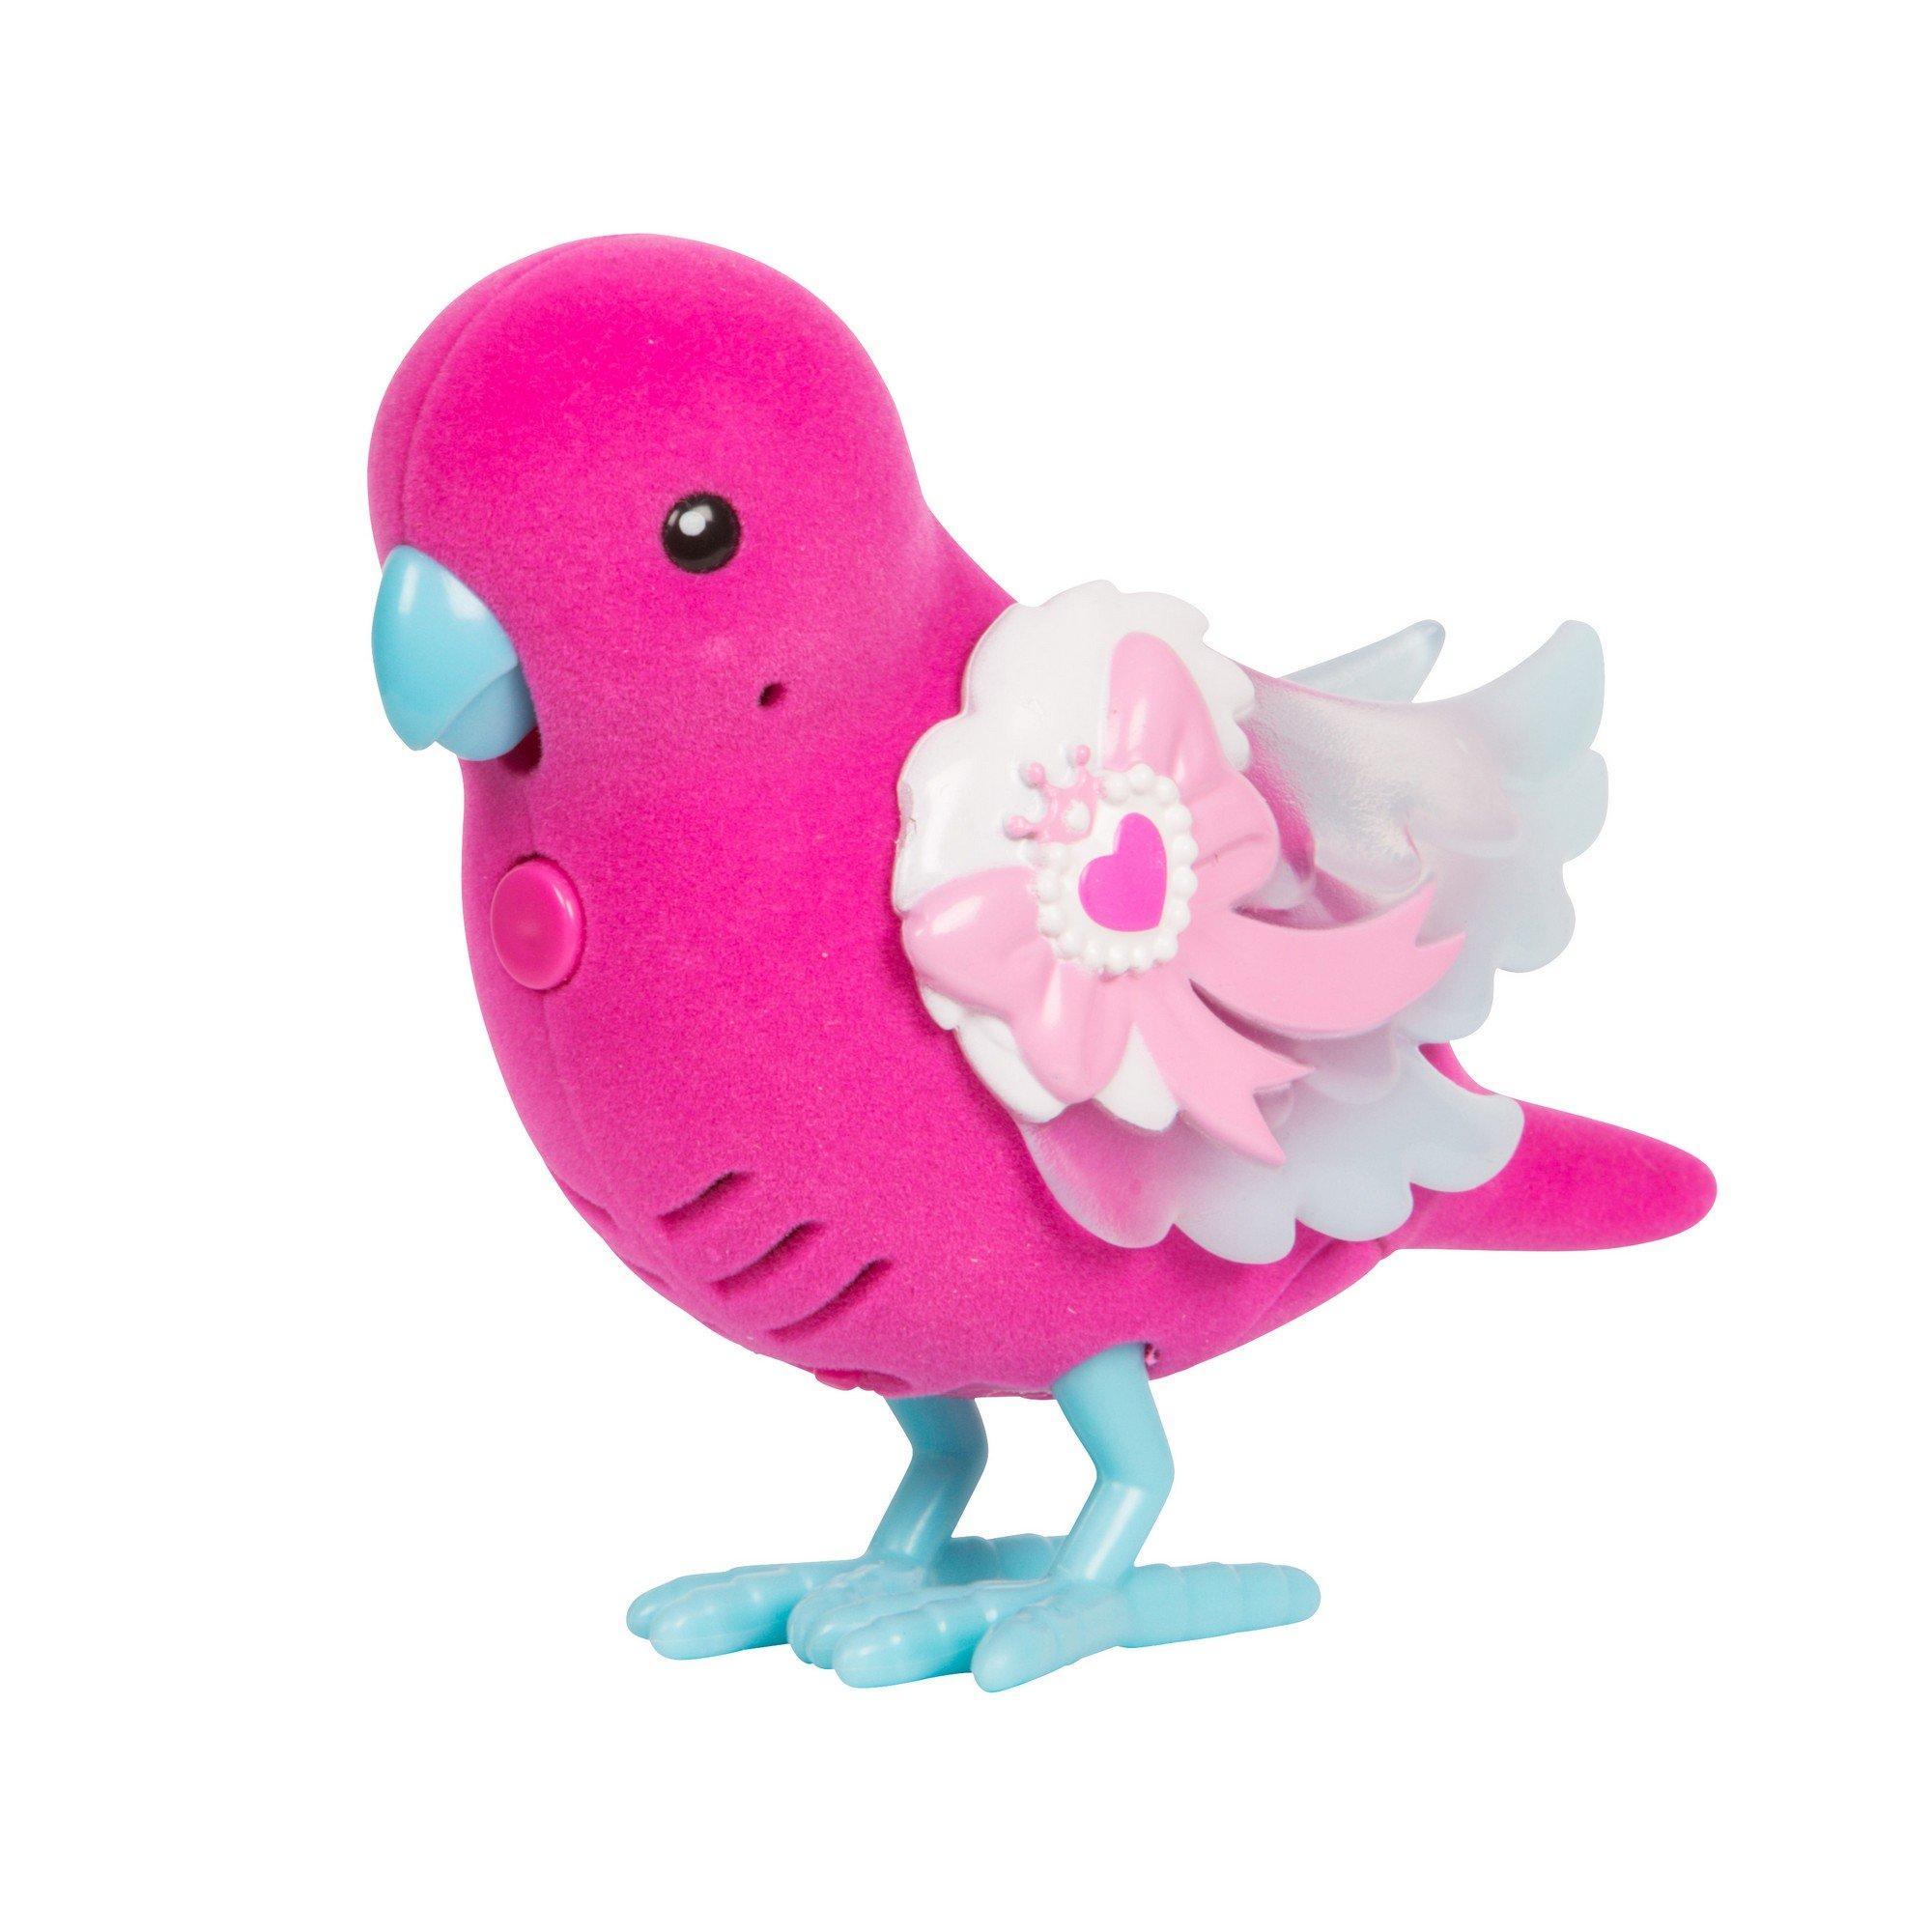 Птичка со светящимися крылышками Сияющий Бантик, на батар.